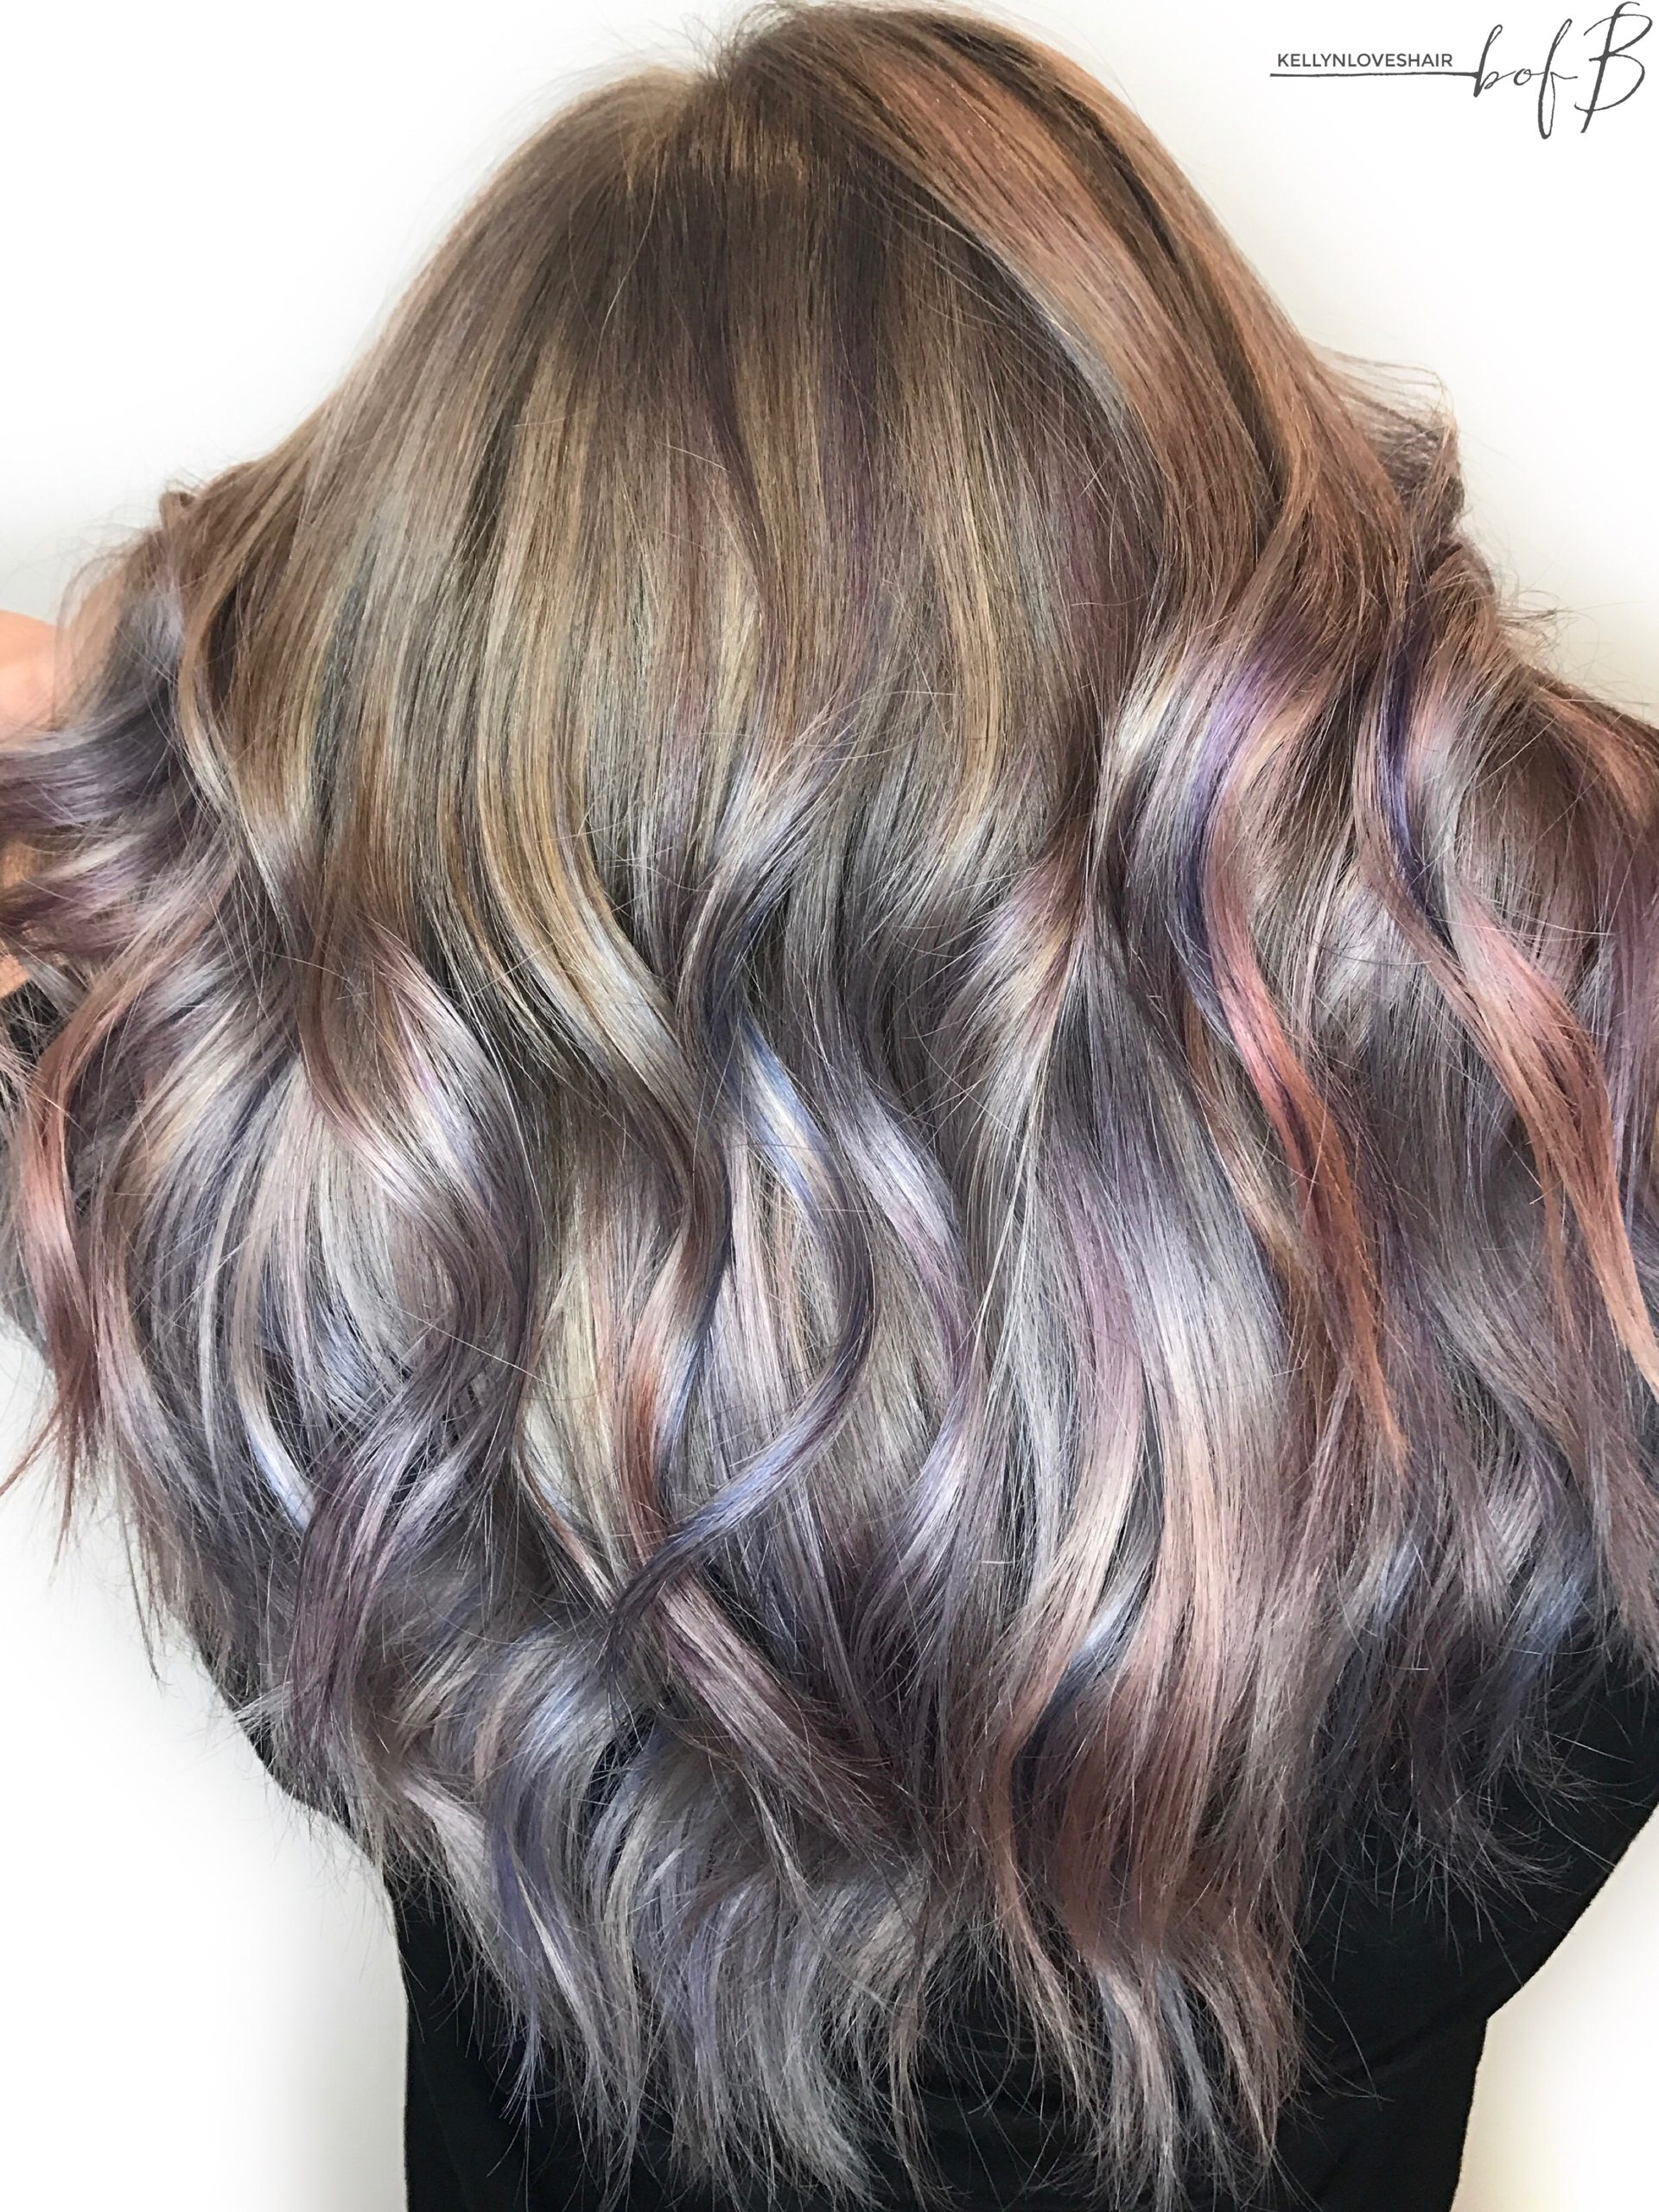 Art color hair - Metallic Hair Color